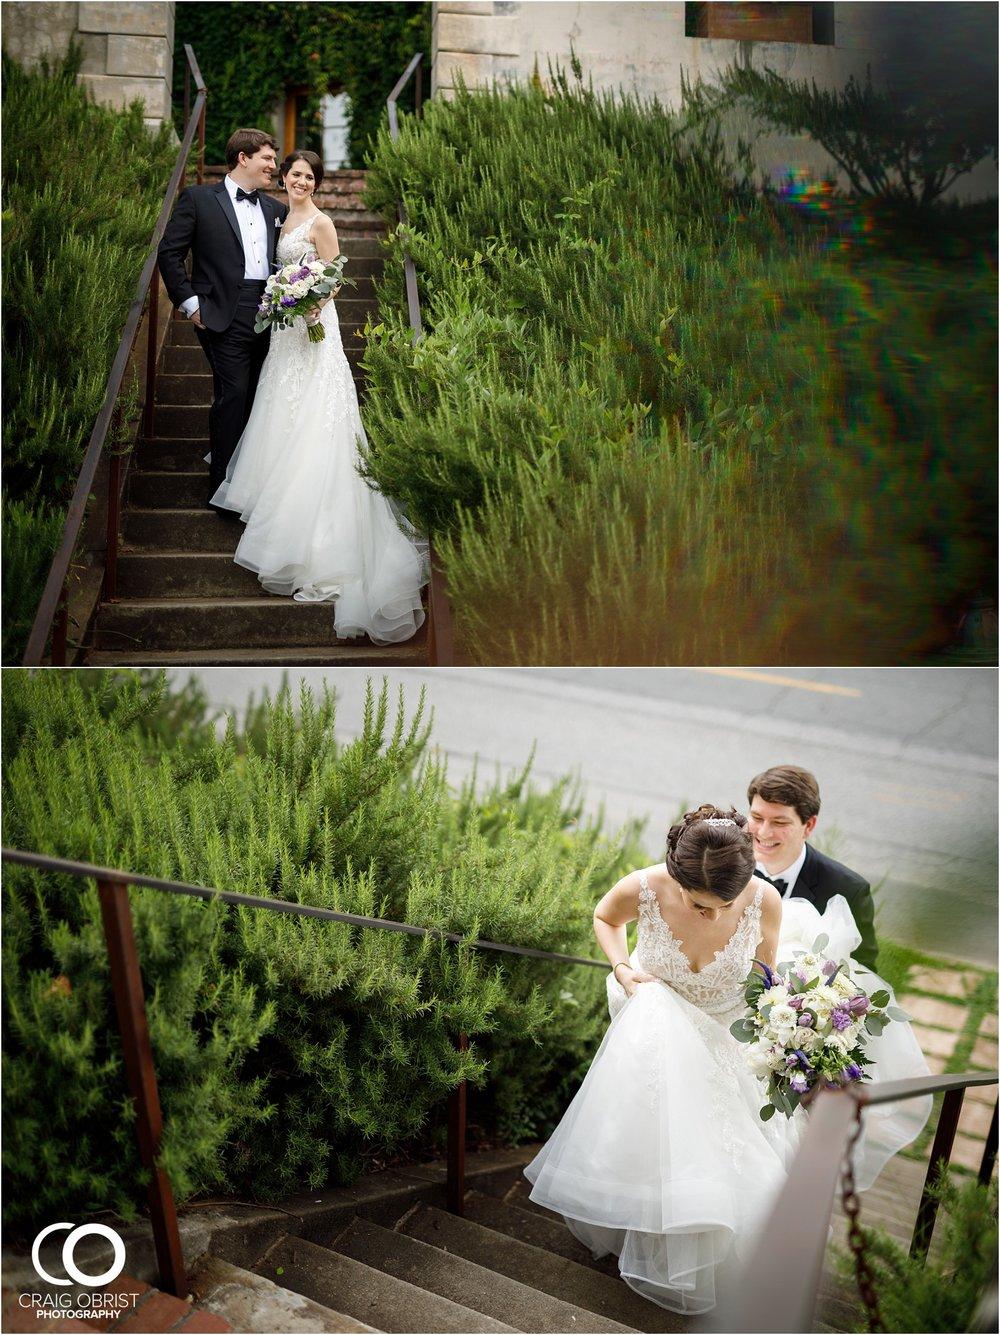 Four Seasons Hotel Atlanta Summerour Studio Wedding Portraits_0032.jpg